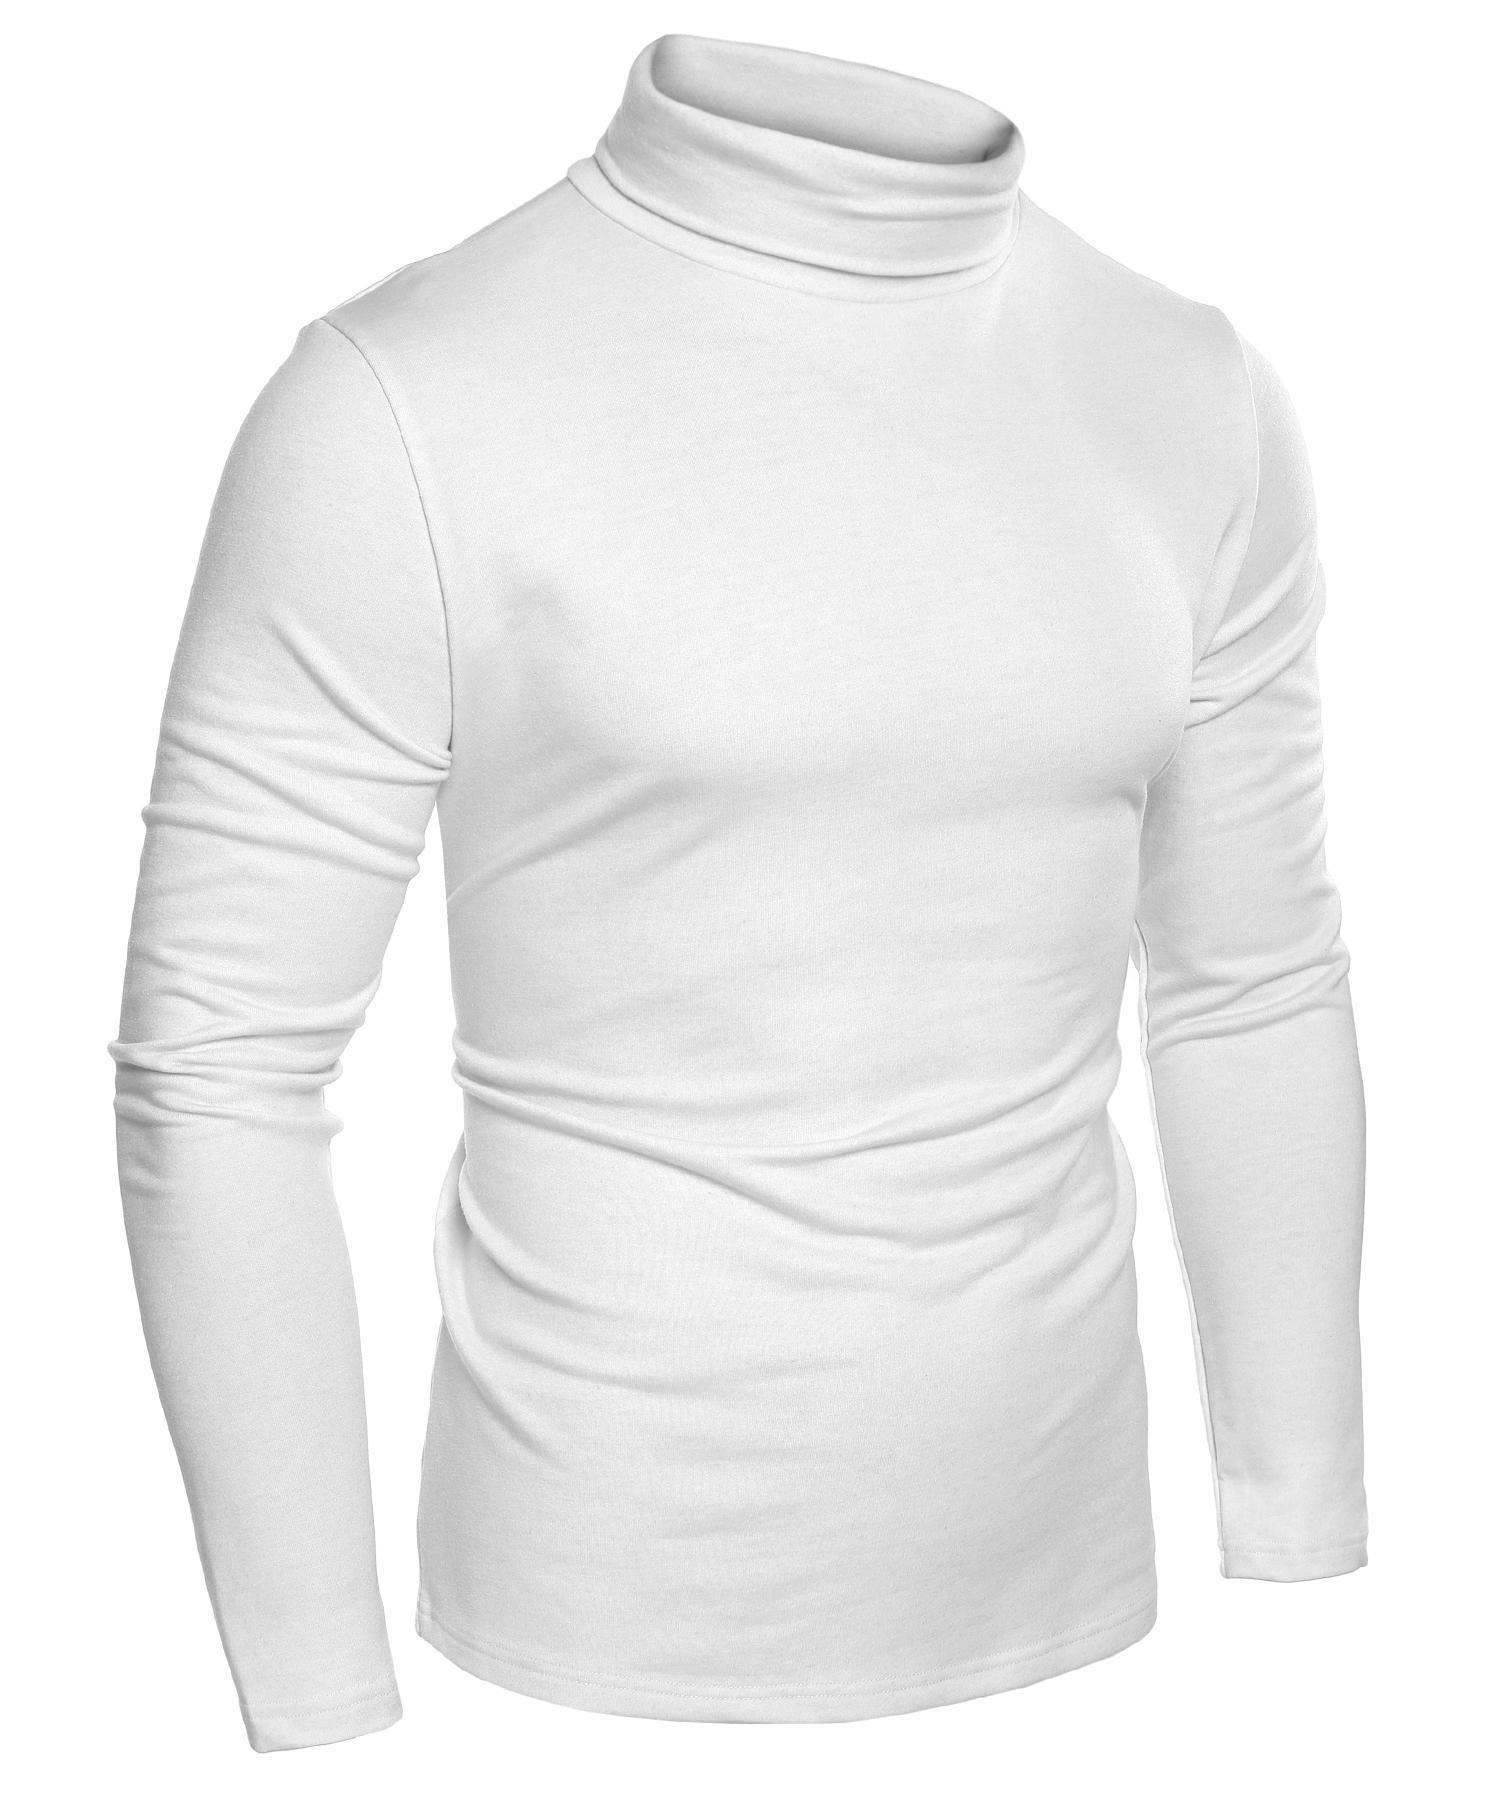 JINIDU Mens Casual Basic Slim Fit Pullover Thermal Sweaters